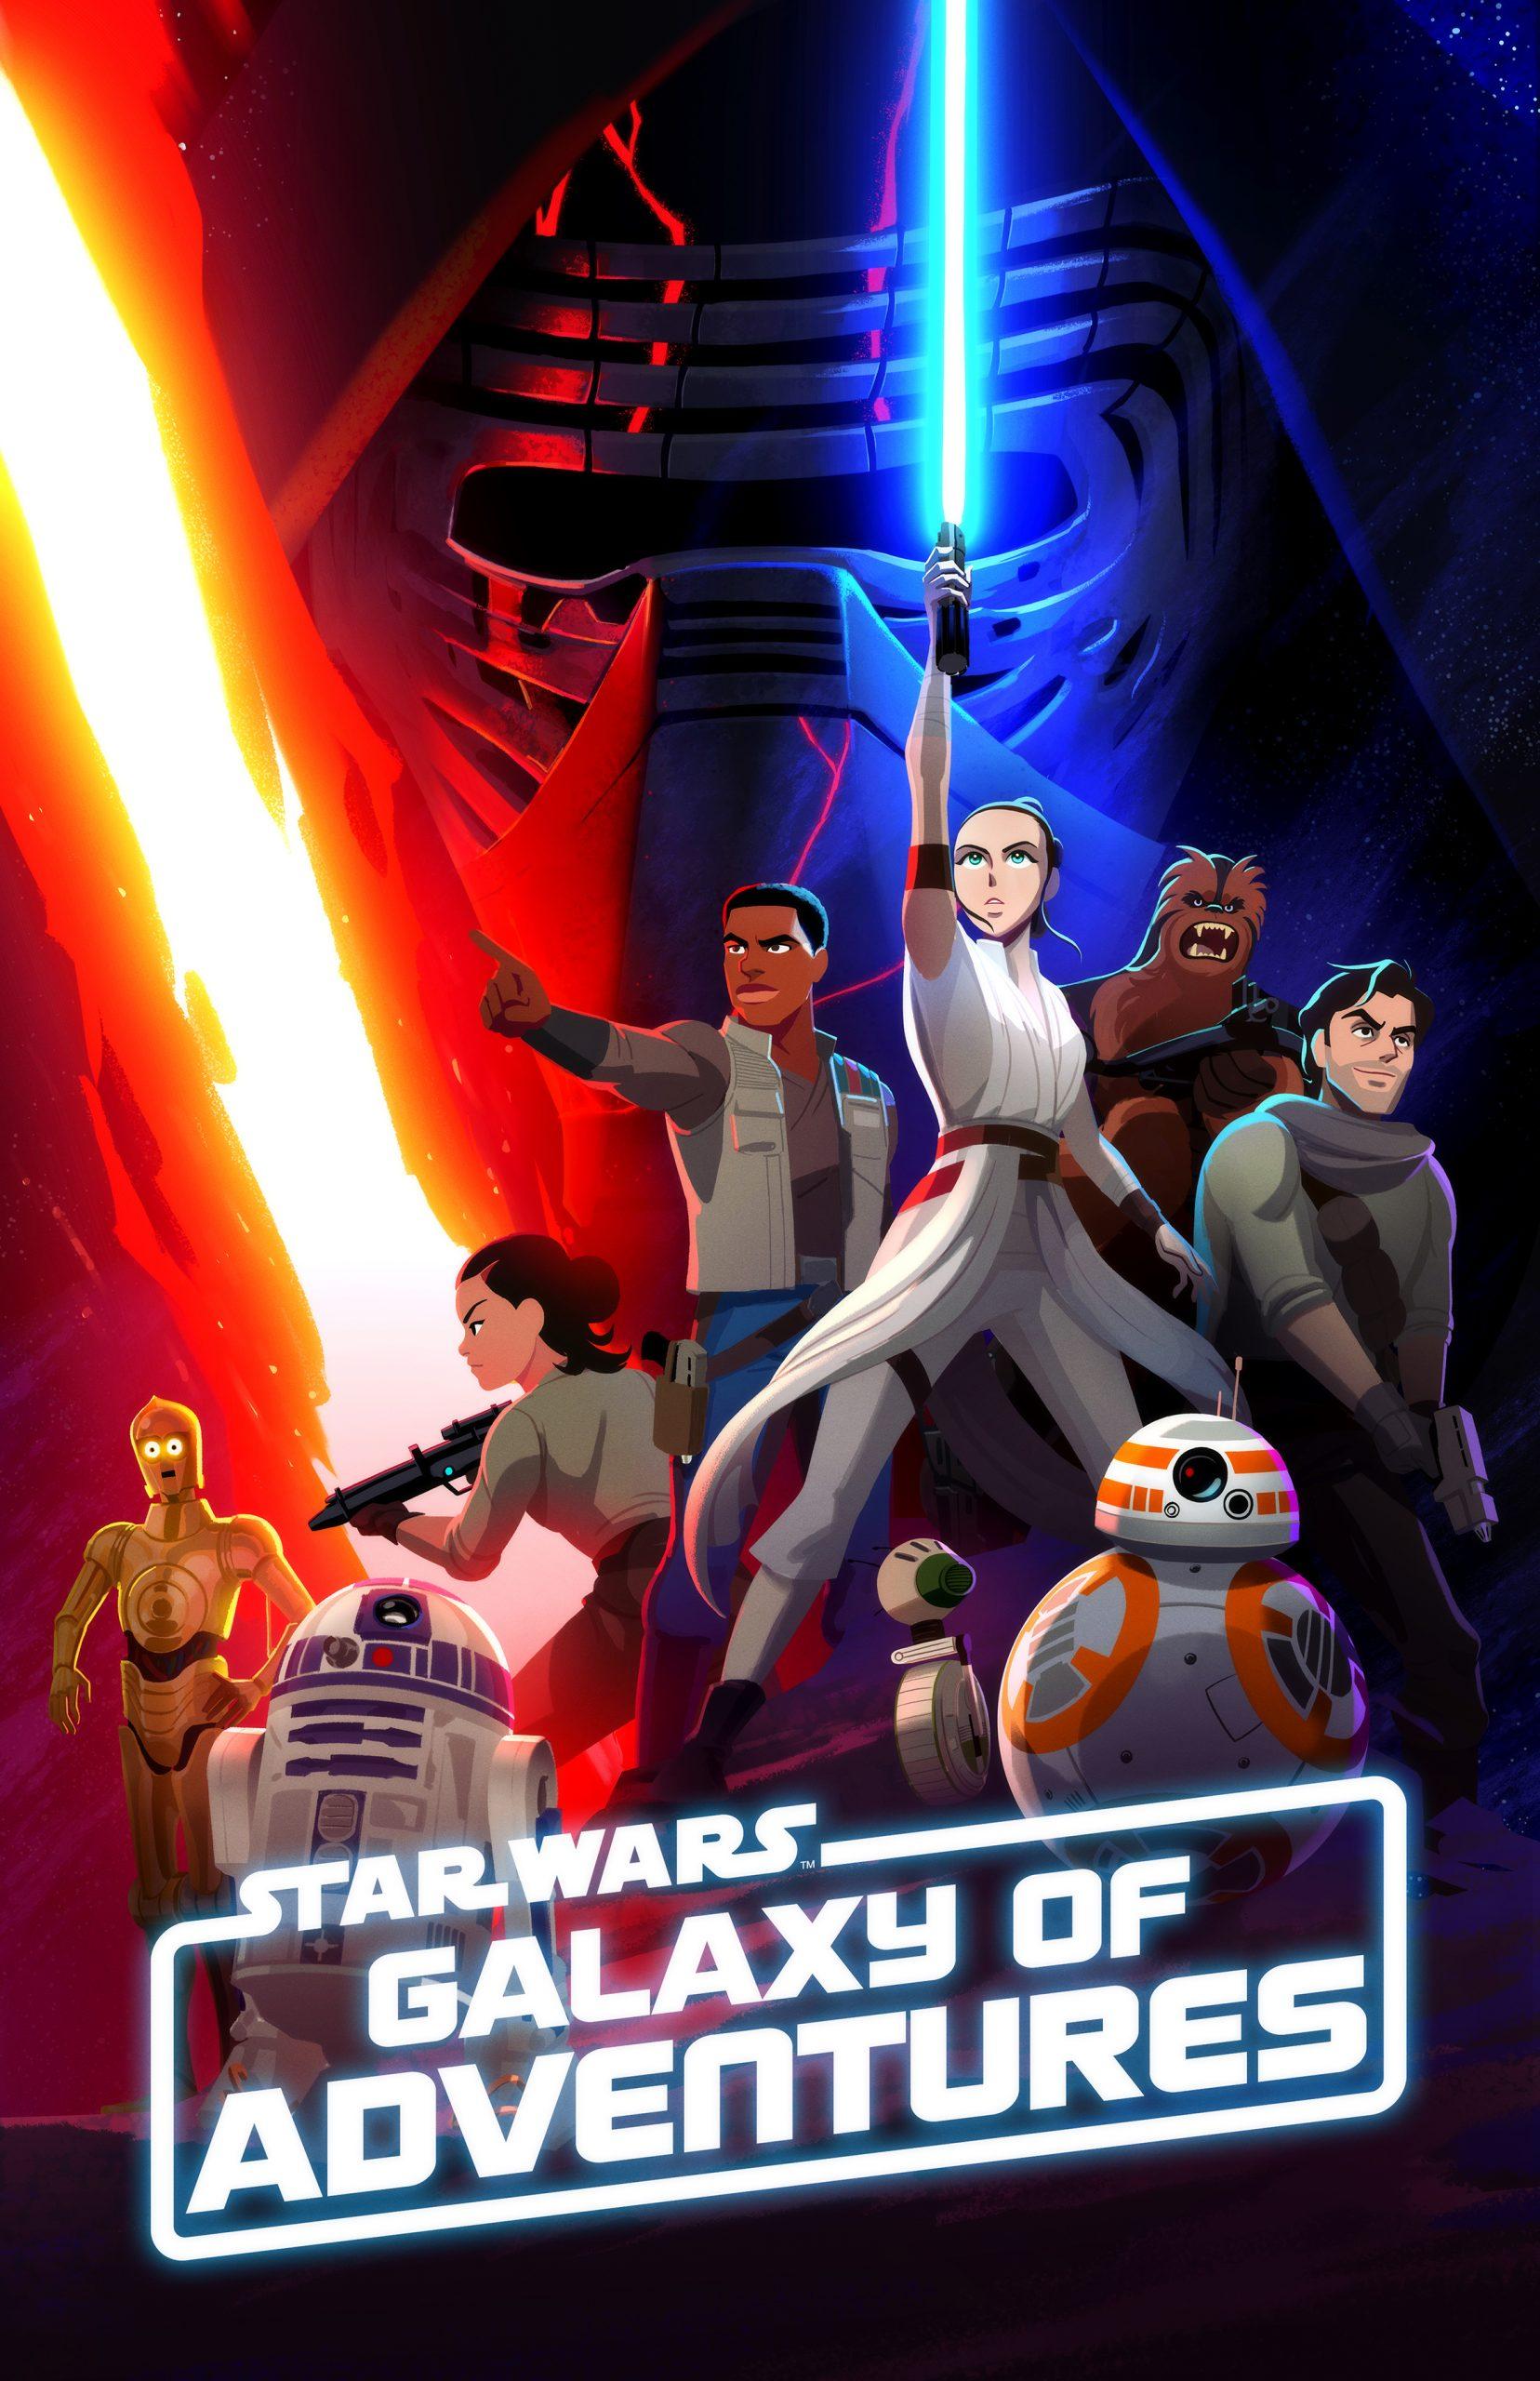 star wars galaxy of adventures season 2 poster